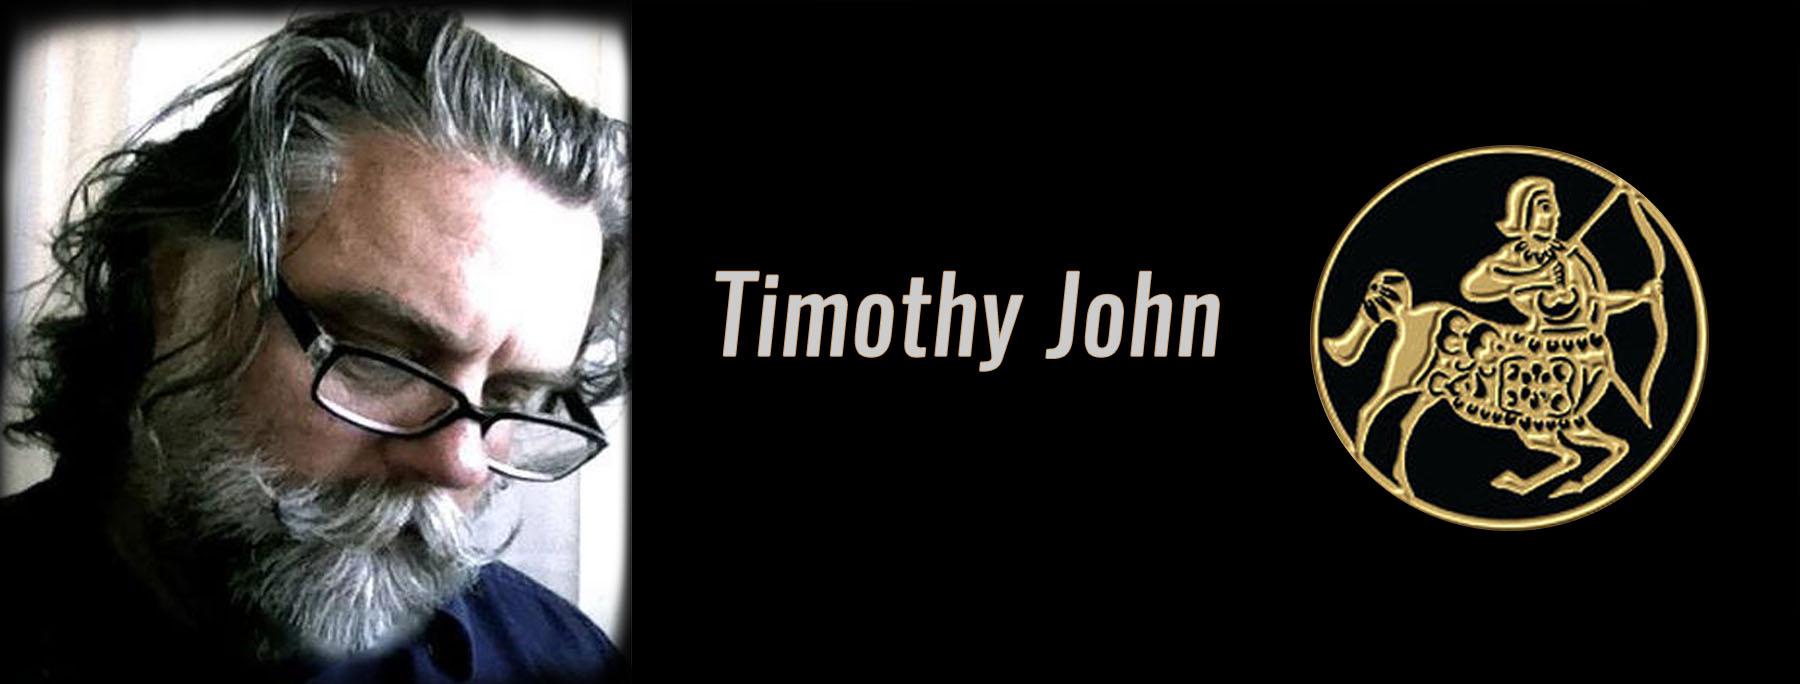 timothy-john-Artist-Dark-Triumph